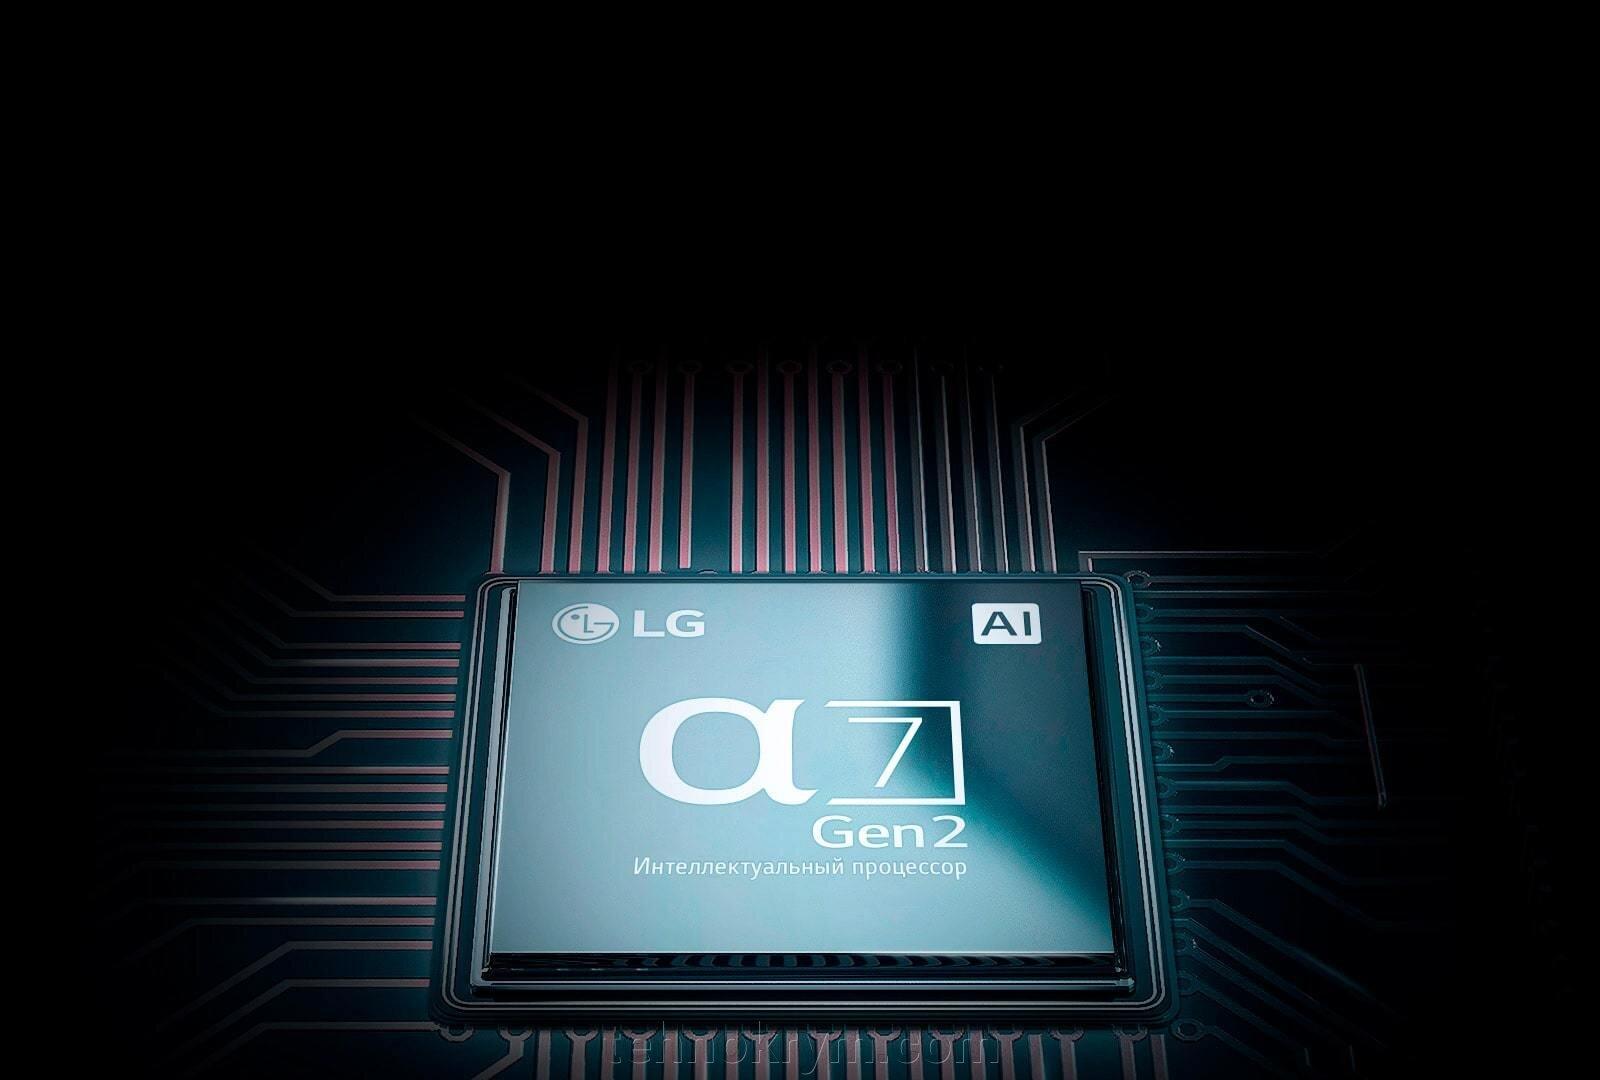 Smart телевизор LG NanoCell 49SM9000PLA, Ultra HD, черный, webOS 4.5 - фото pic_7a307f3b1c93e0f98a7cc2c0ad013572_1920x9000_1.jpg